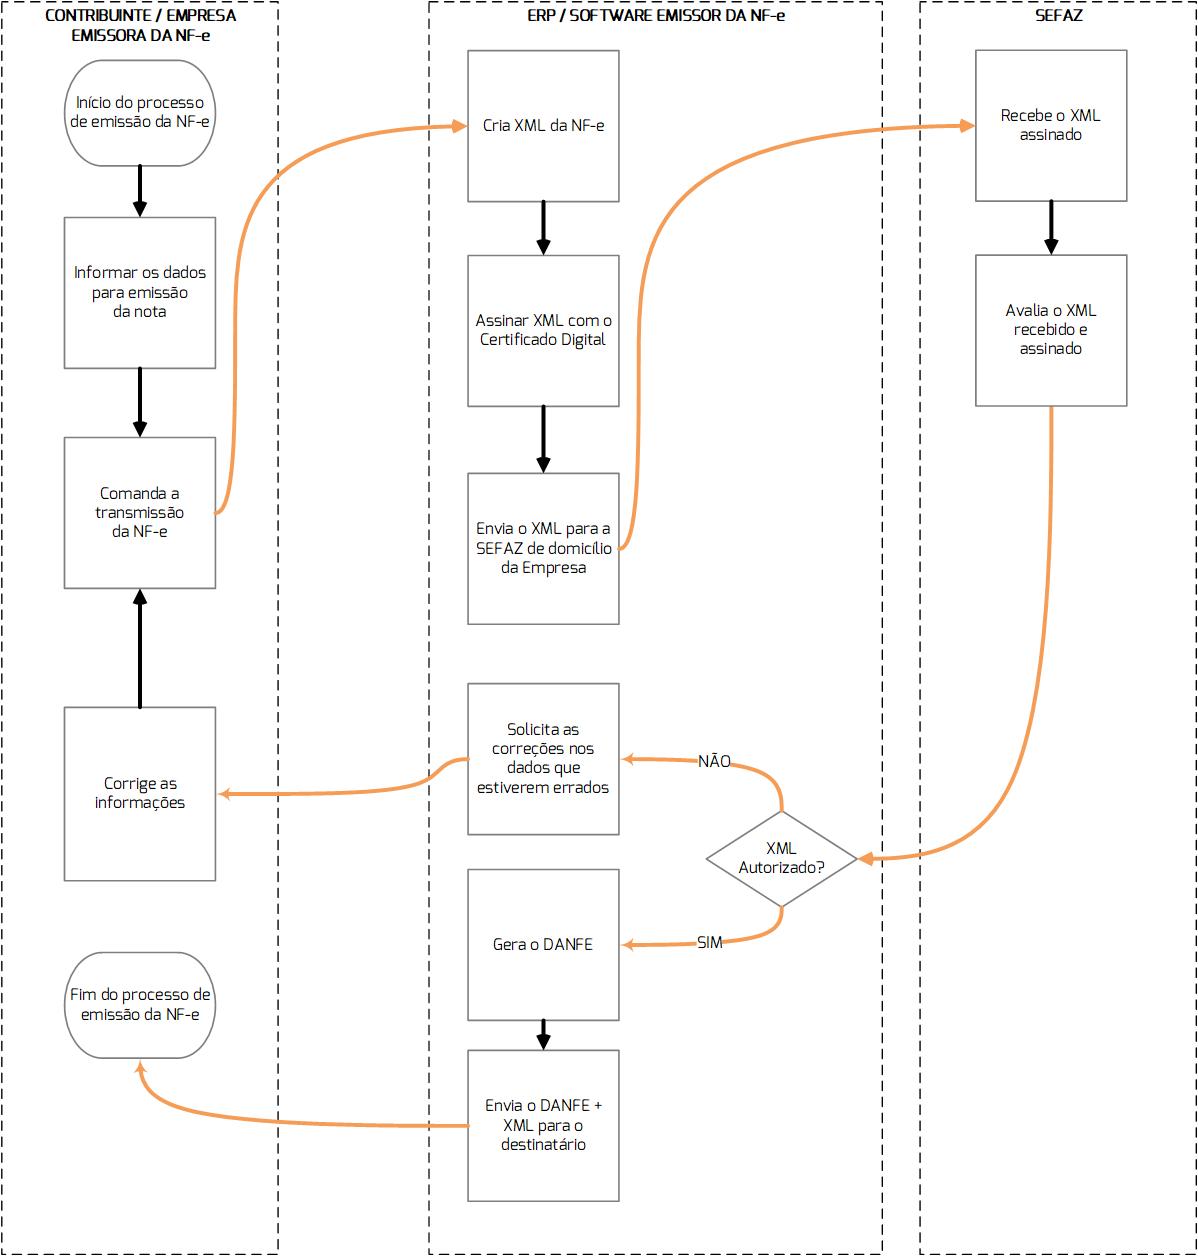 nota fiscal eletronica nf-e fluxograma cr sistemas e web